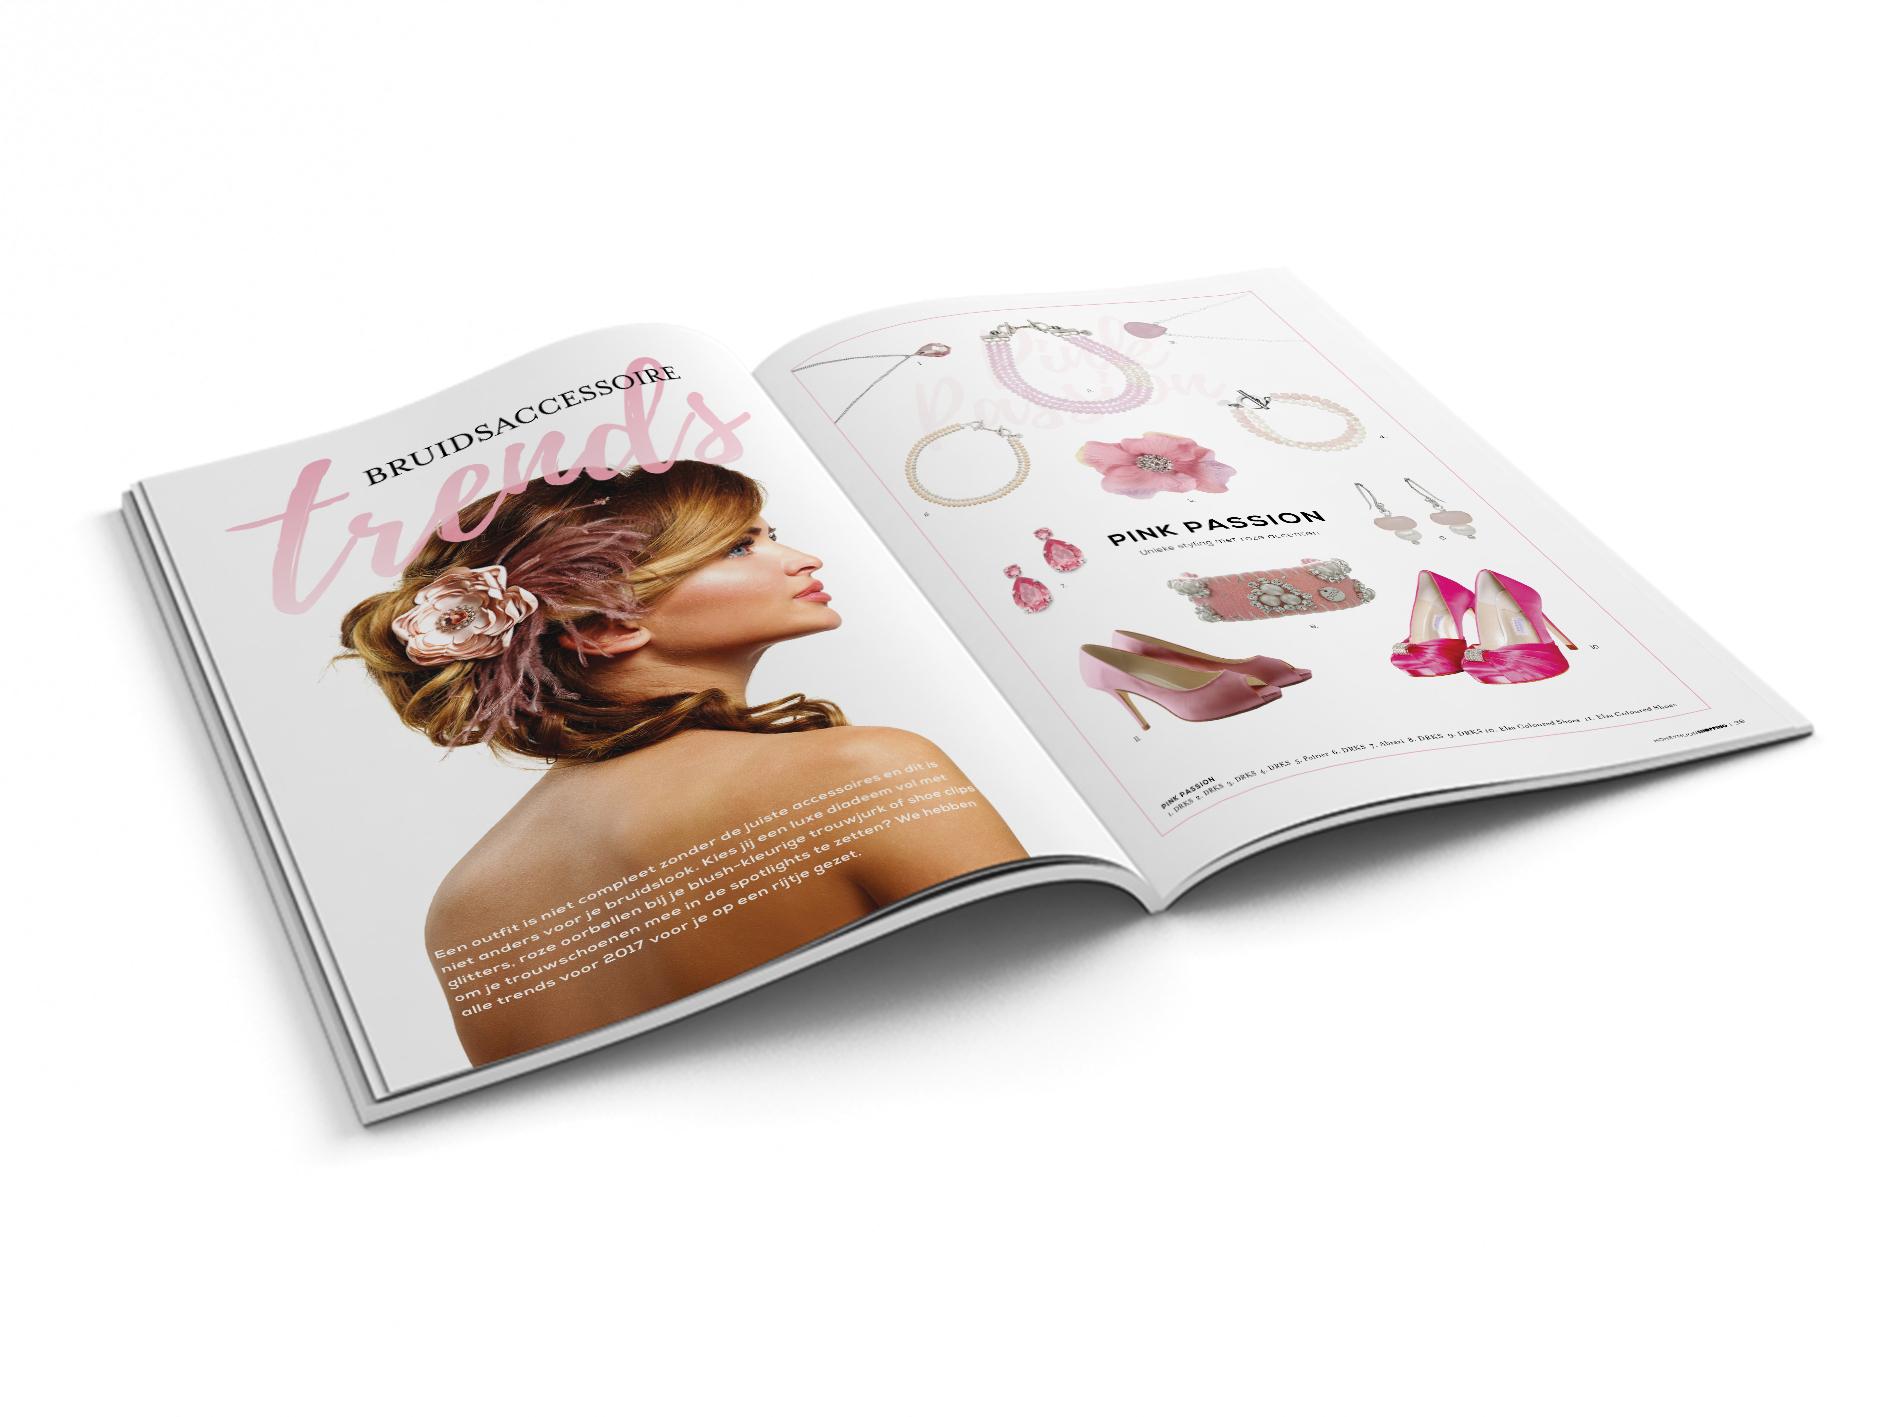 ACCESSOIRES, bruidsaccessoire, trends, bruidsmagazine